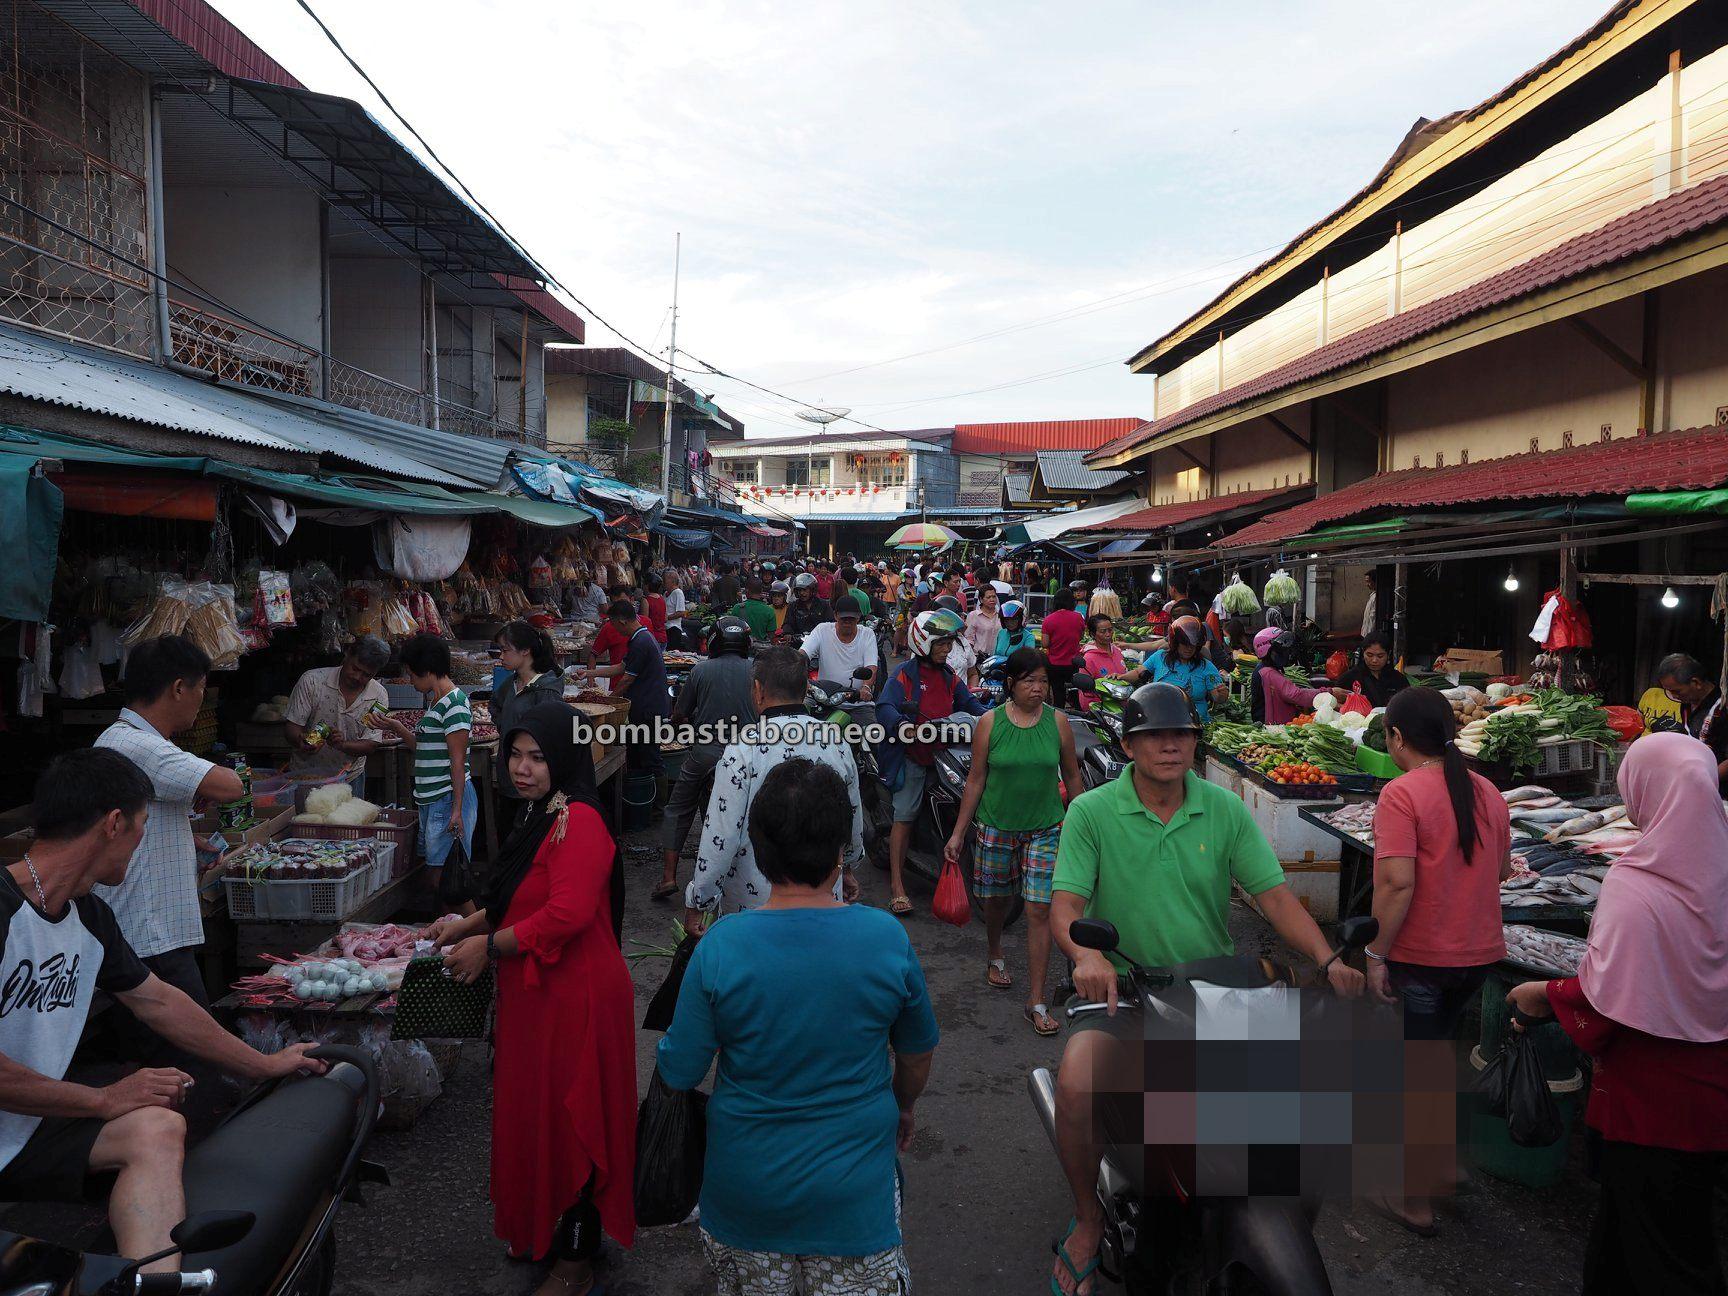 Pasar Turi, authentic, destination, Kota Amoi, seafood, fish, sayuran, vegetable, Tourism, tourist attraction, travel guide, Cross Border, Borneo, 印尼西加里曼丹, 山口洋早市